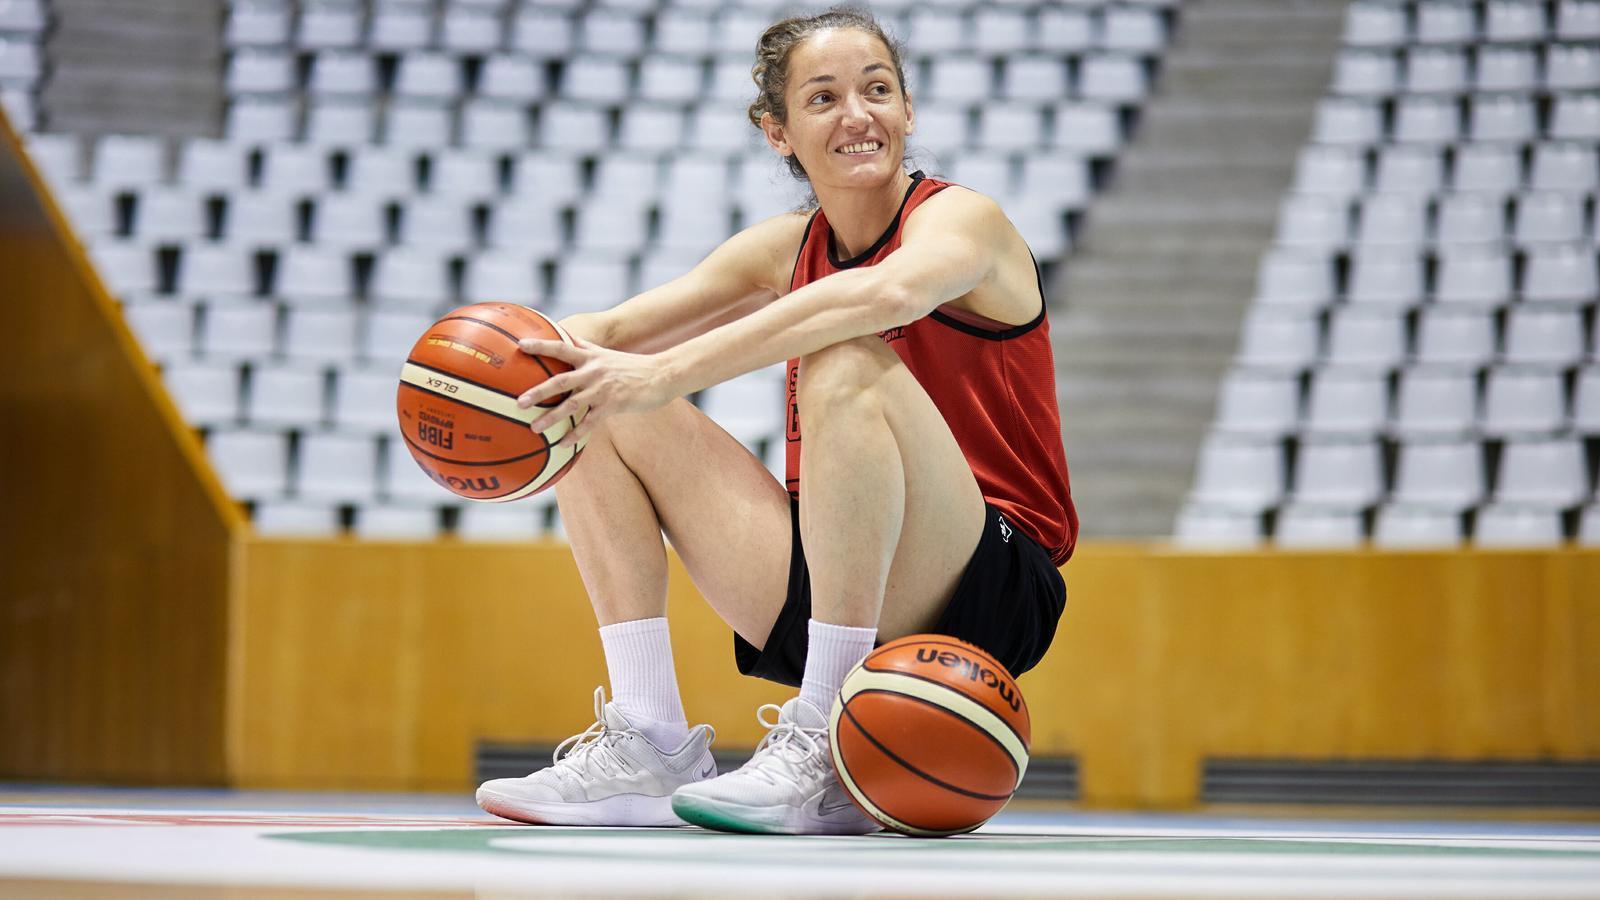 Laia Palau, jugadora de l'Spar Citylift Girona